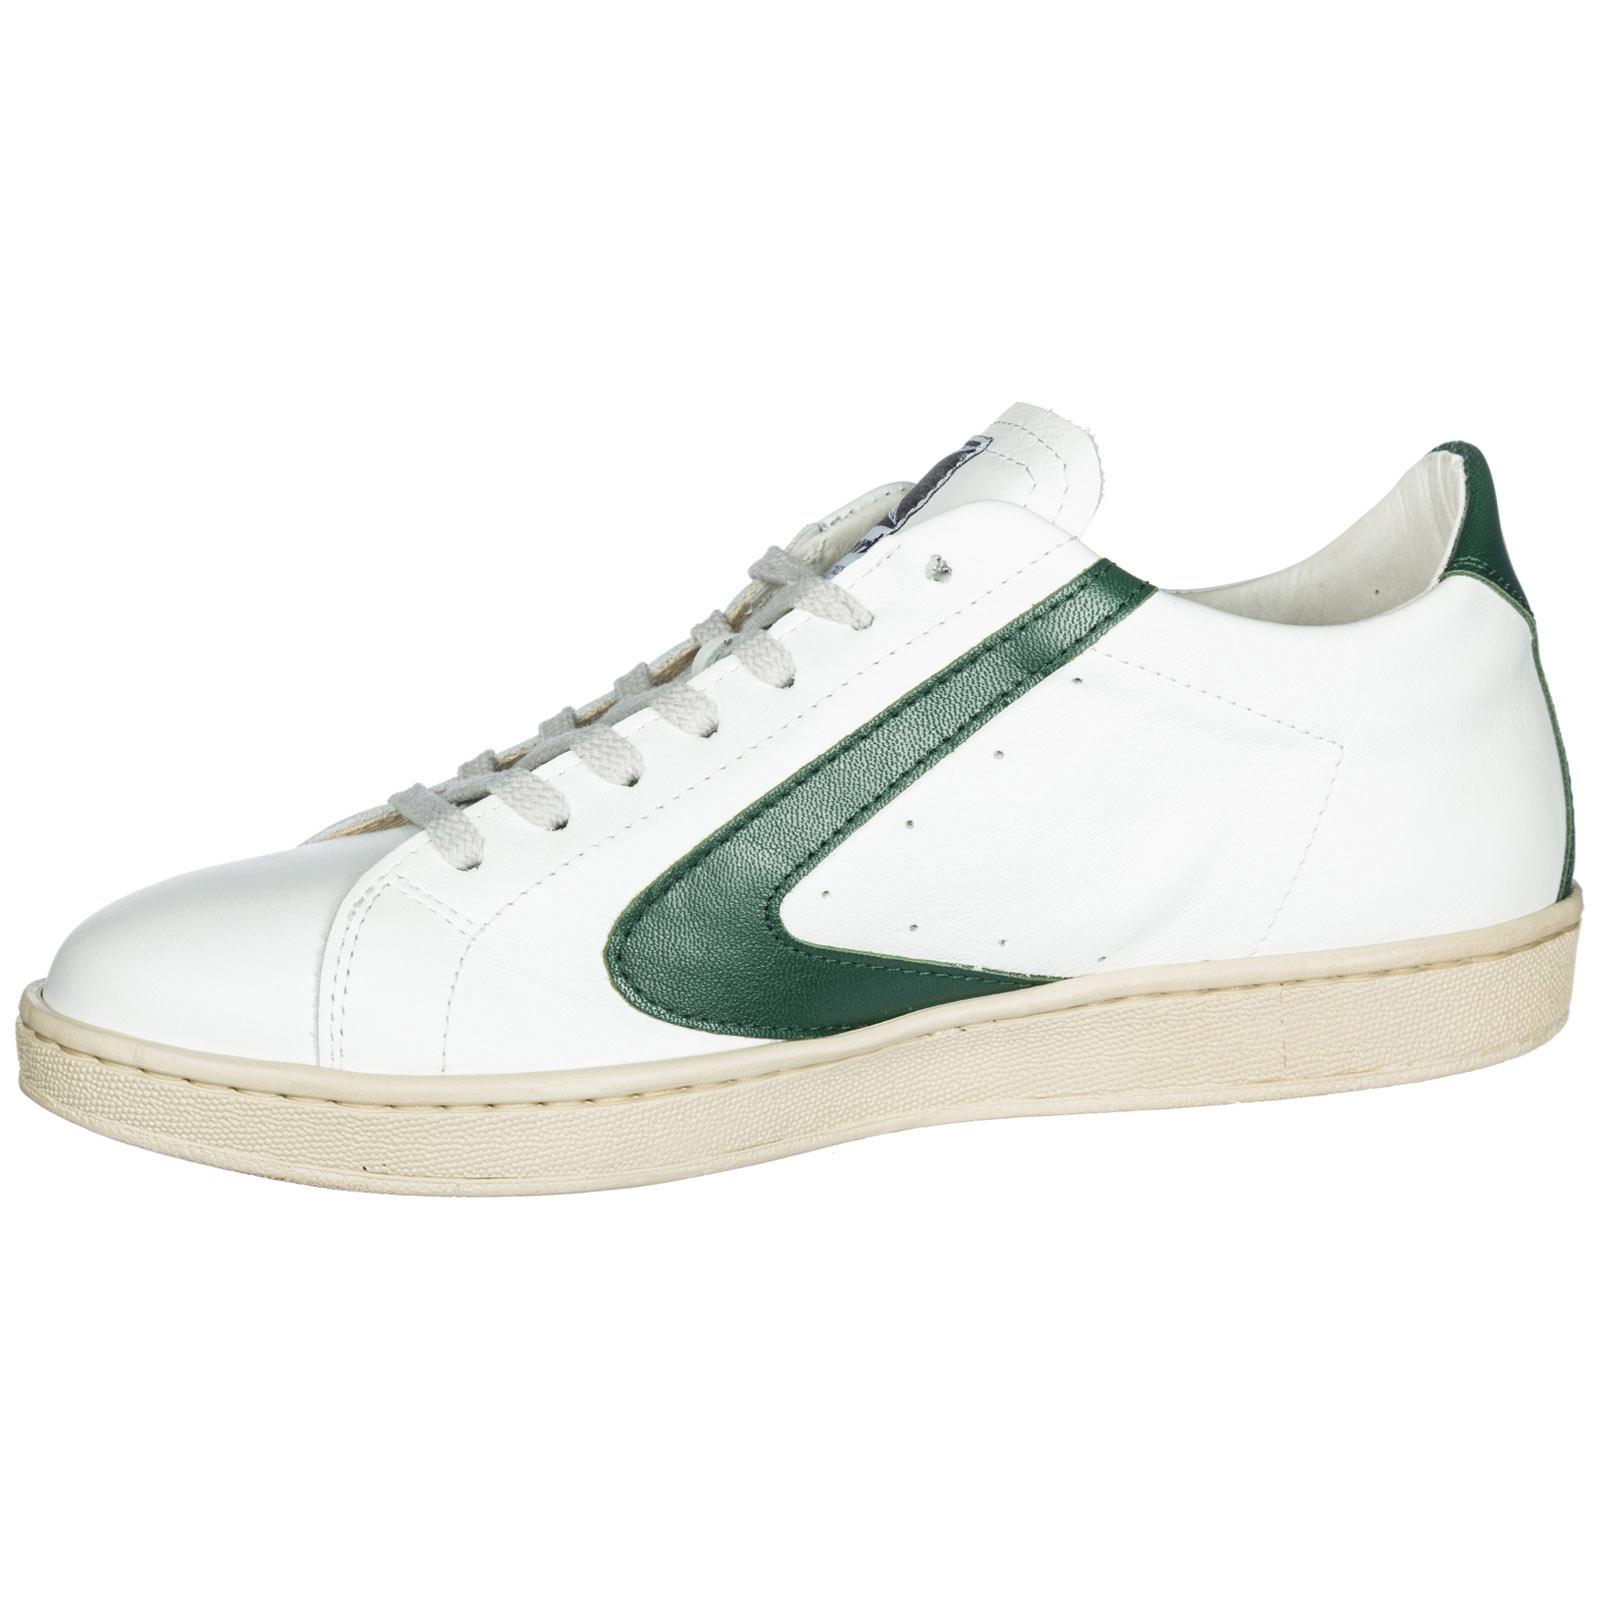 Scarpe sneakers uomo in pelle tournament